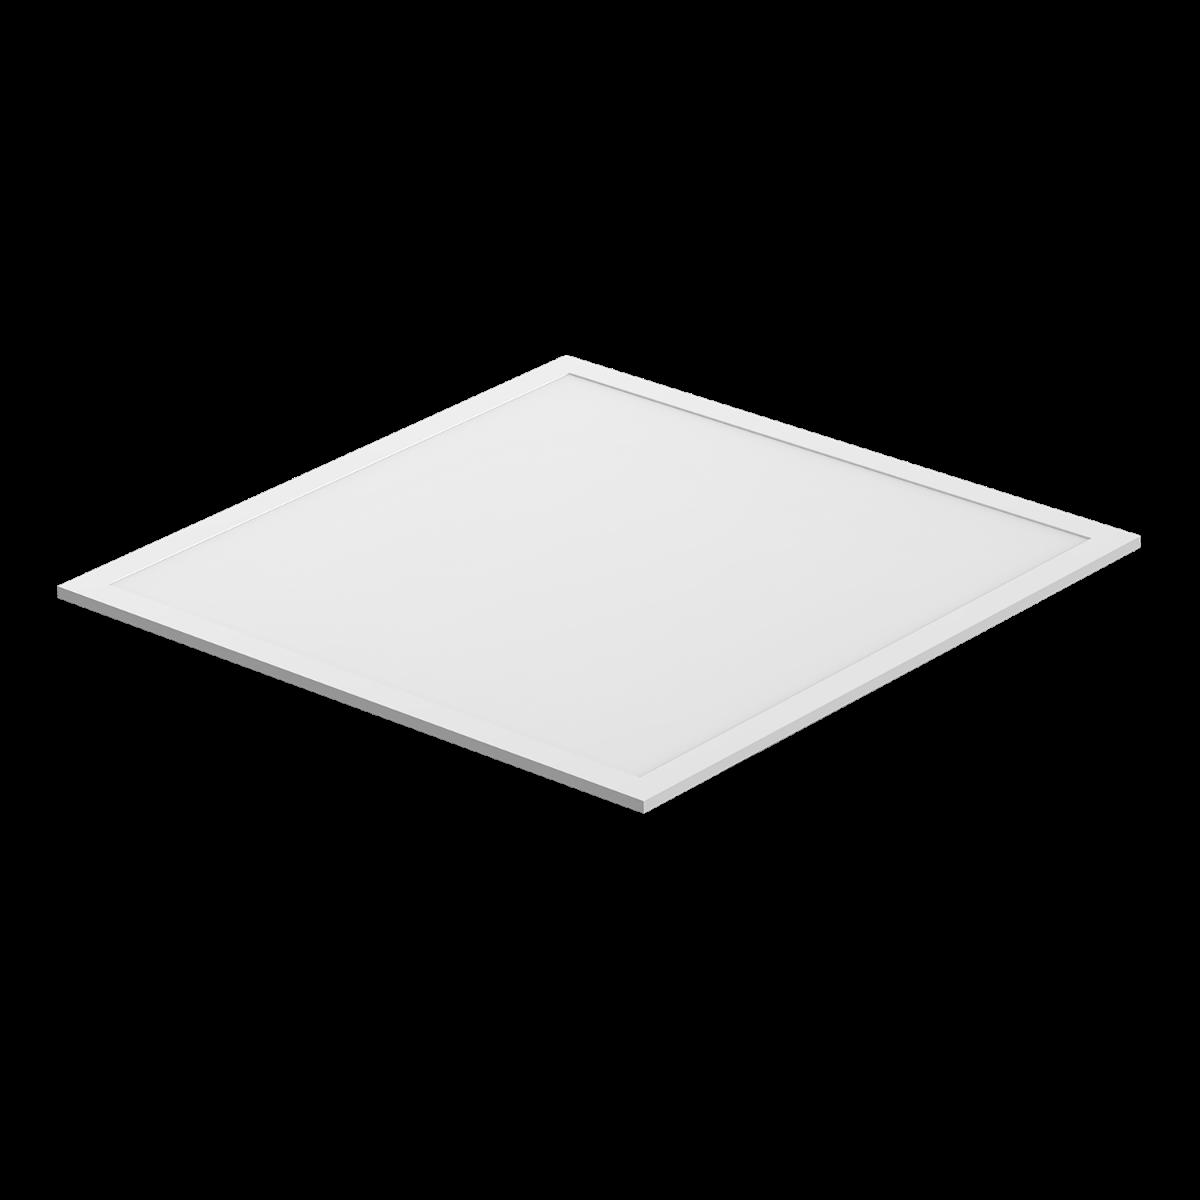 Noxion LED panel Econox 32W Xitanium DALI 60x60cm 3000K 3900lm UGR <22 | Dali dæmpbar - varm hvid - erstatter 4x18W